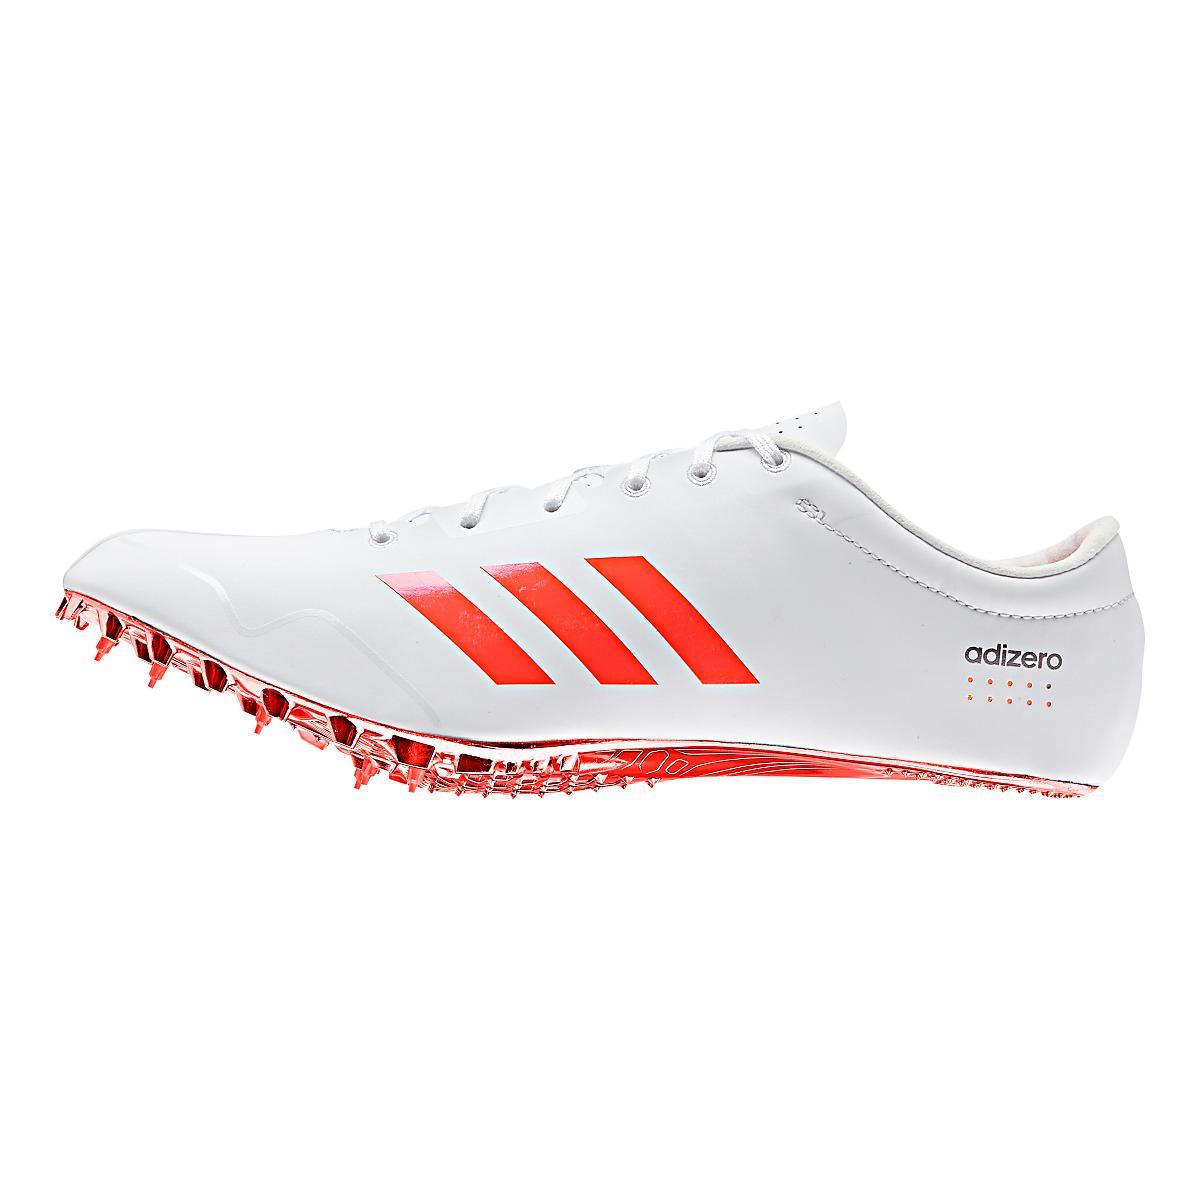 3e606def1cad adidas Adizero Prime SP Racing Shoe at Road Runner Sports